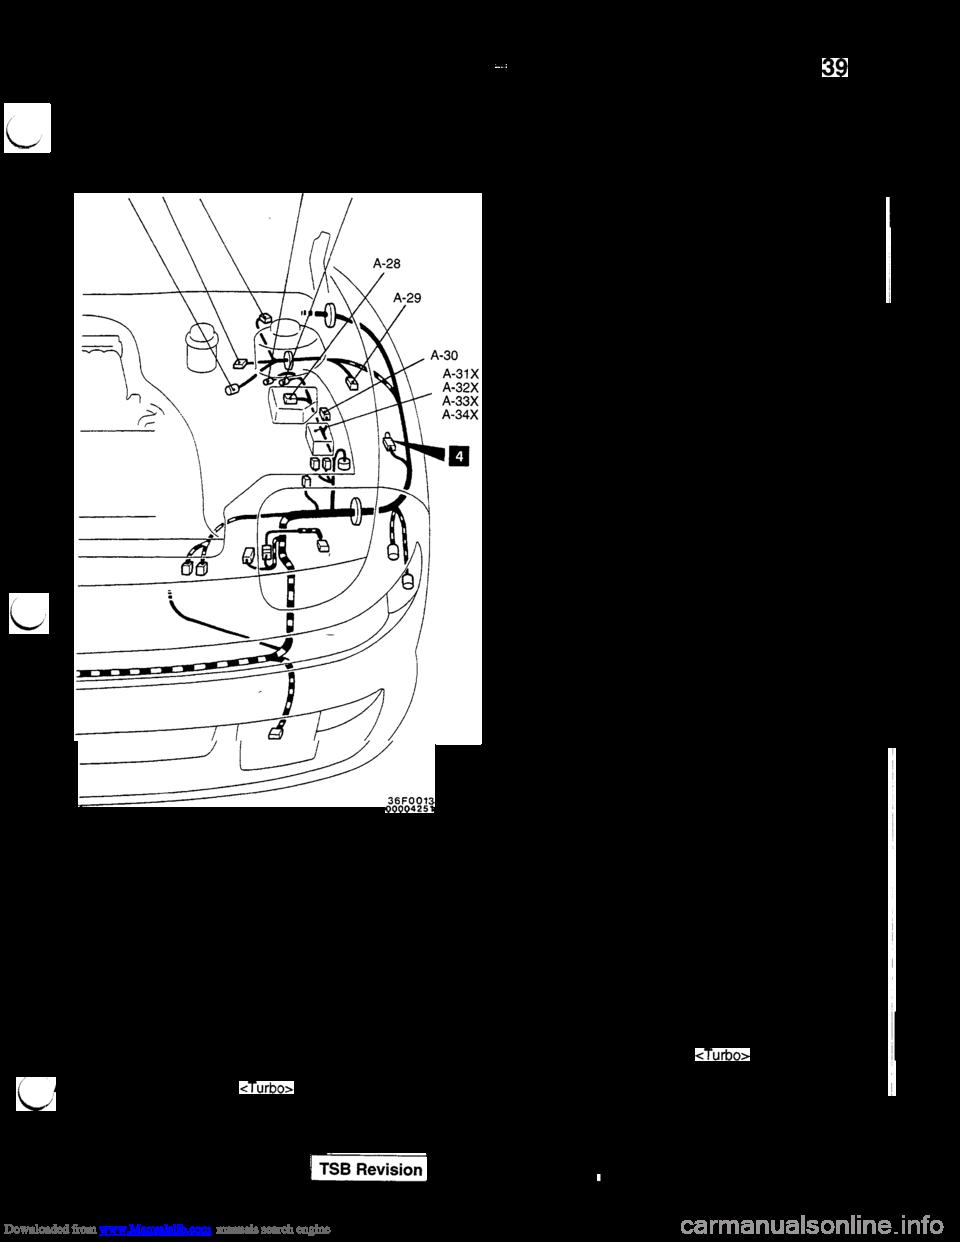 Mitsubishi 3000gt 1994 2g Workshop Manual 02 Lancer Horn Wiring Diagram